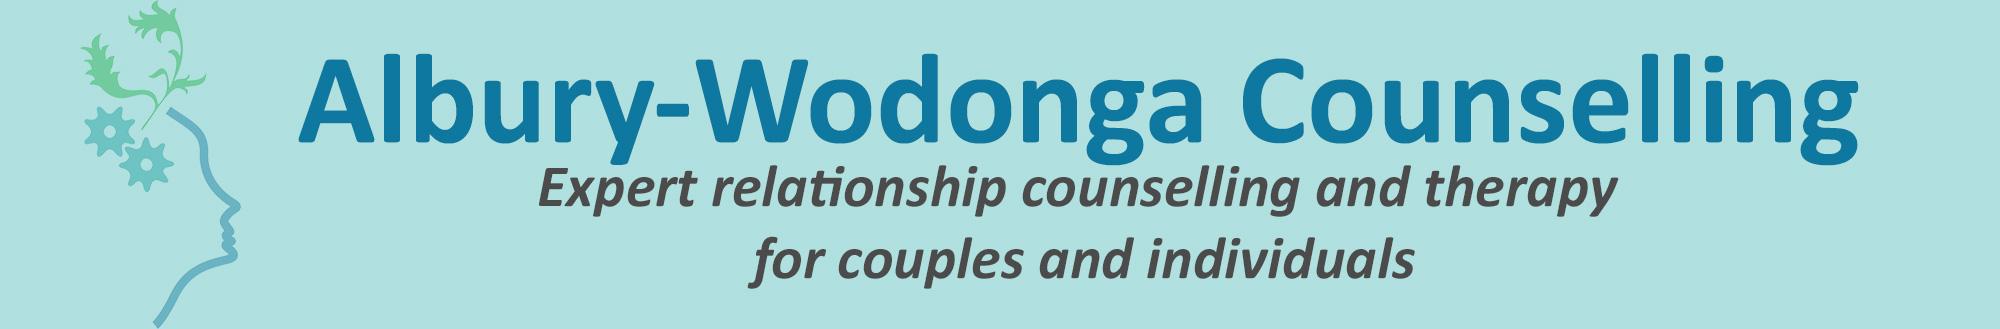 Albury Wodonga Counselling